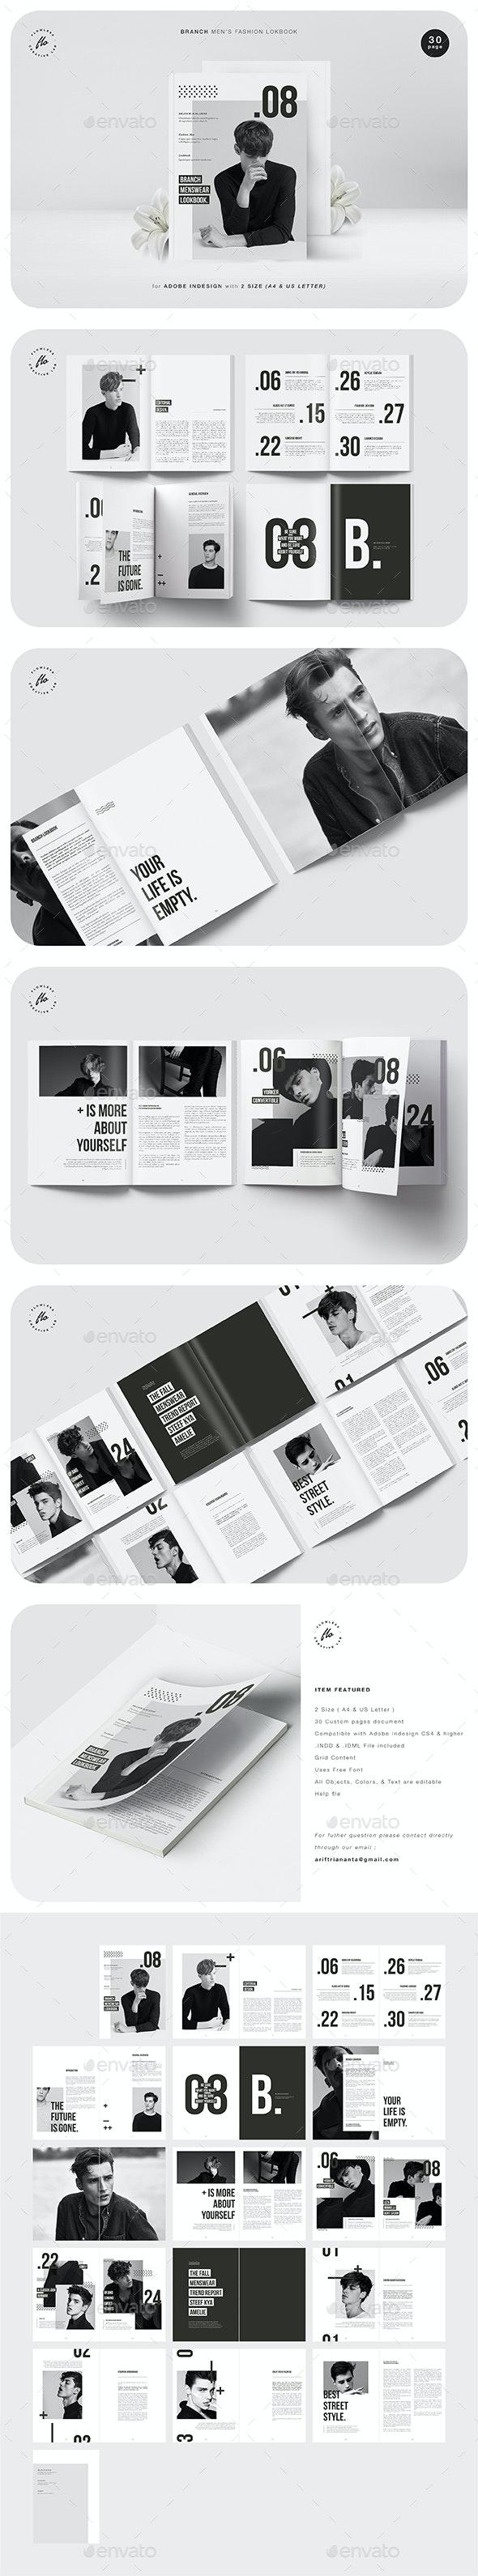 Branch Men's Fashion Lookbook - Magazines Print Templates